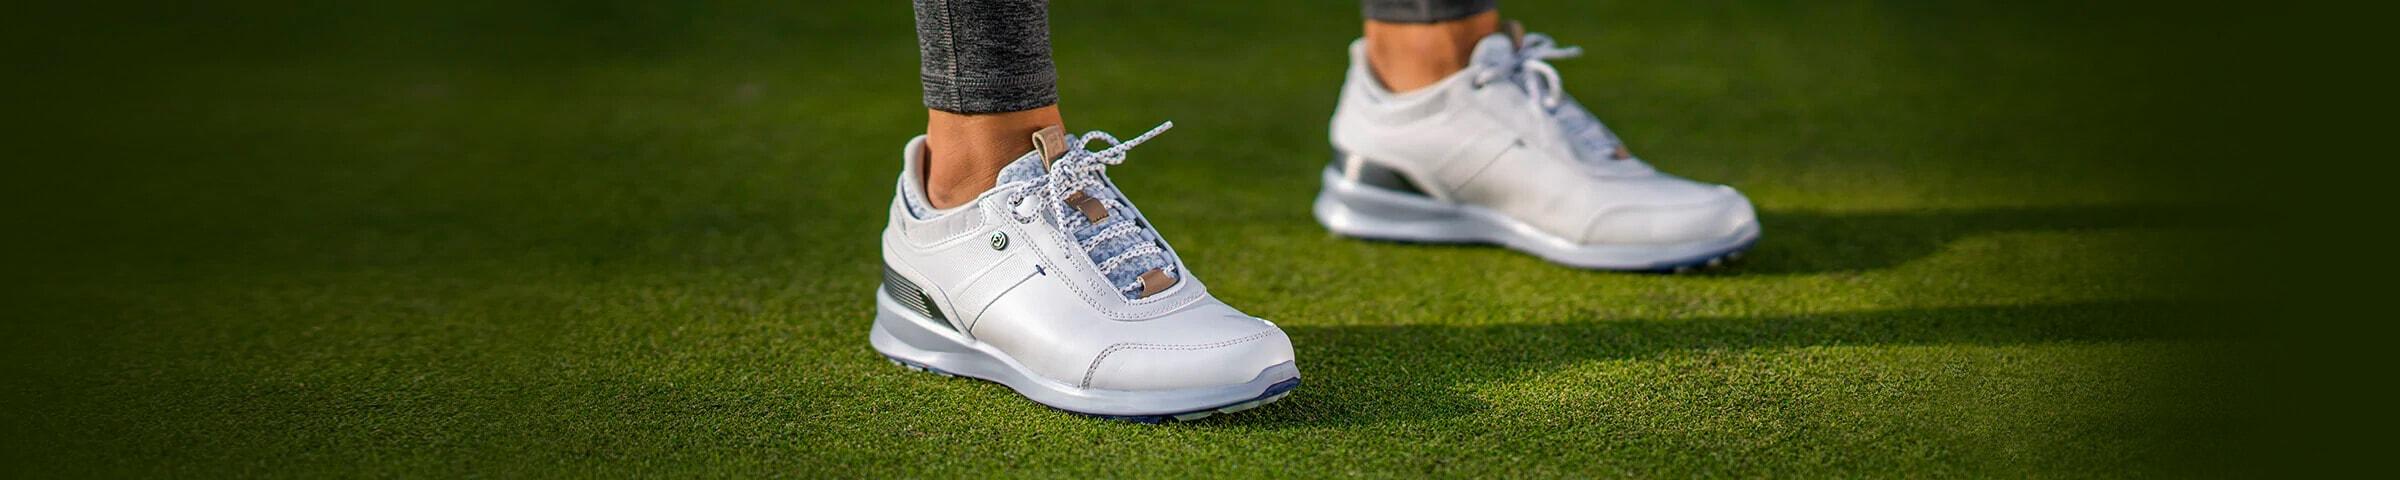 Chaussures de Golf sans Crampon Femmes